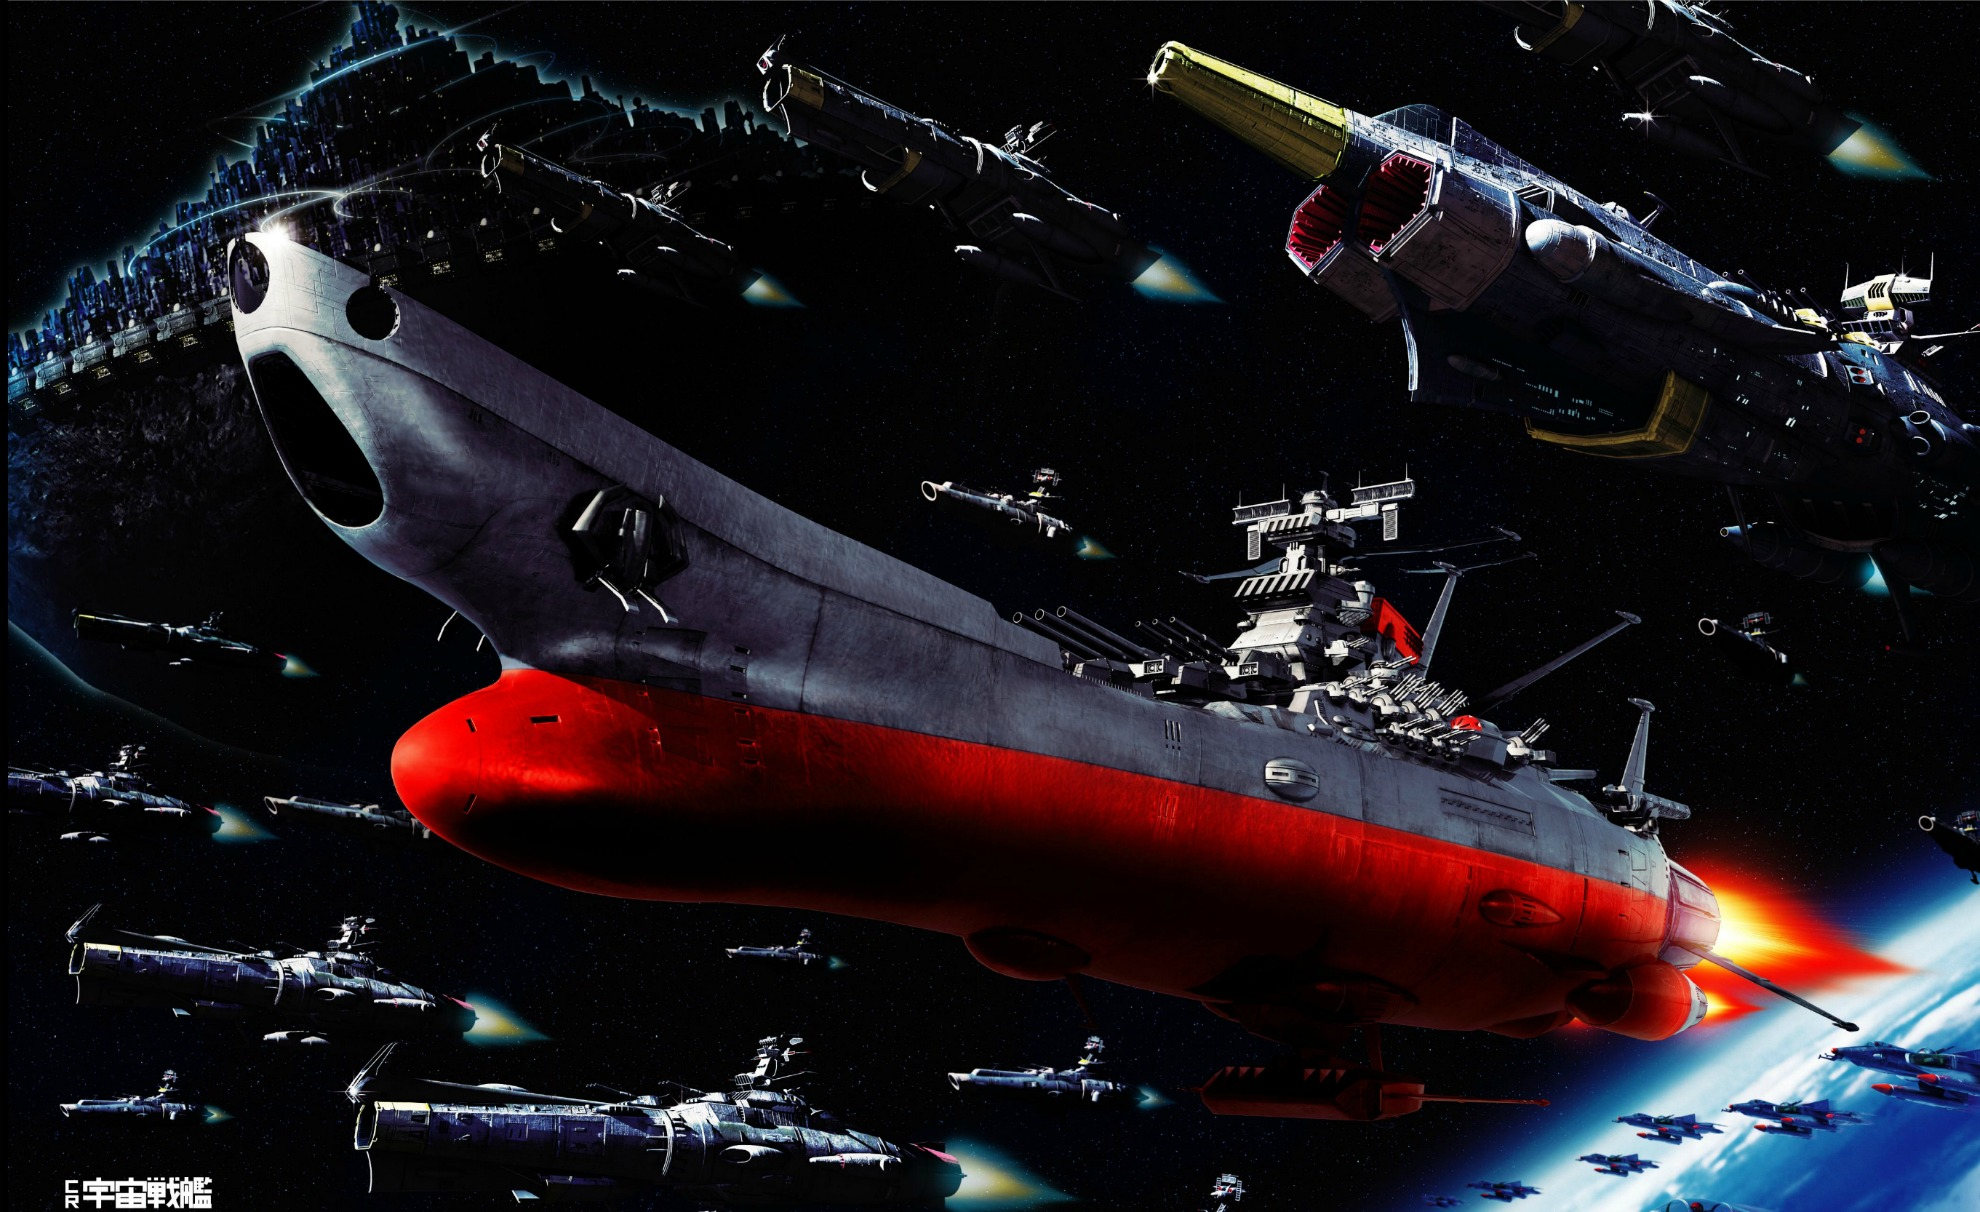 Sci Fi Desktop Backgrounds: Sci Fi Spaceship Wallpaper